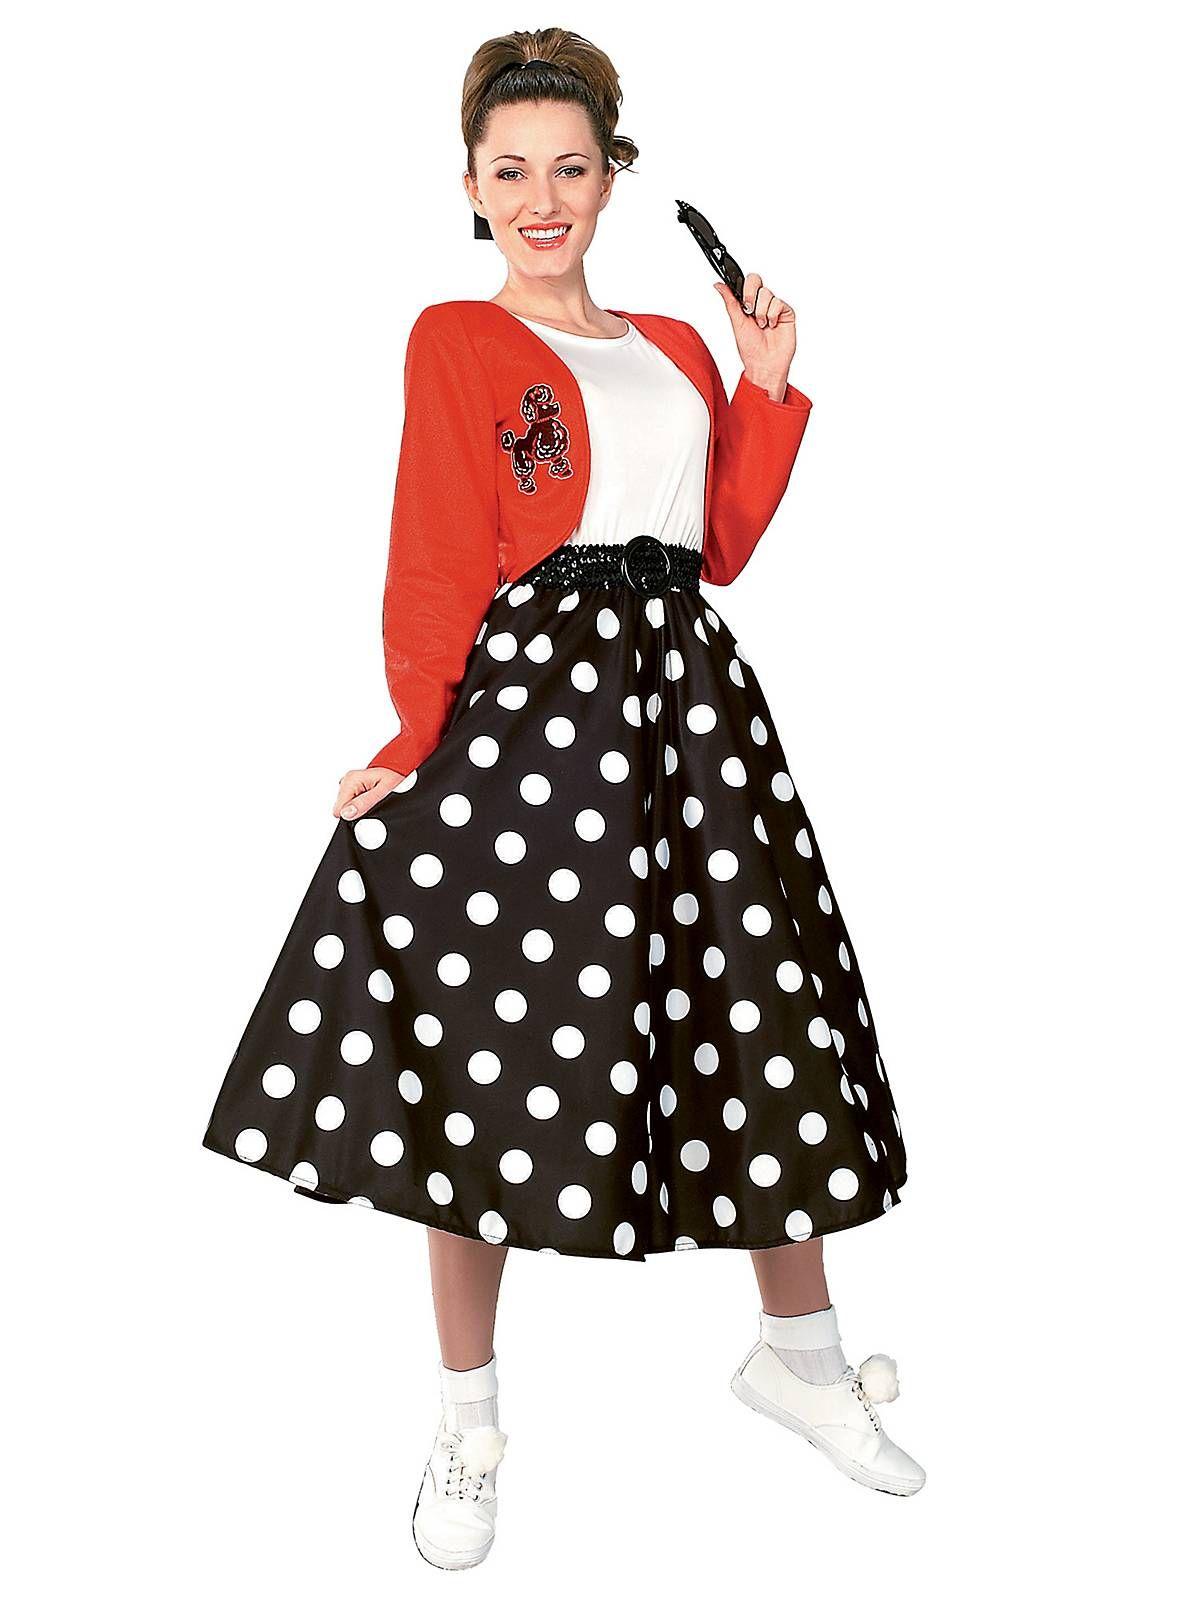 Polka Dot Rocker Costume | Womens 50s Halloween Costumes  sc 1 st  Pinterest & Polka Dot Rocker Adult Costume | Pinterest | 50s halloween costumes ...